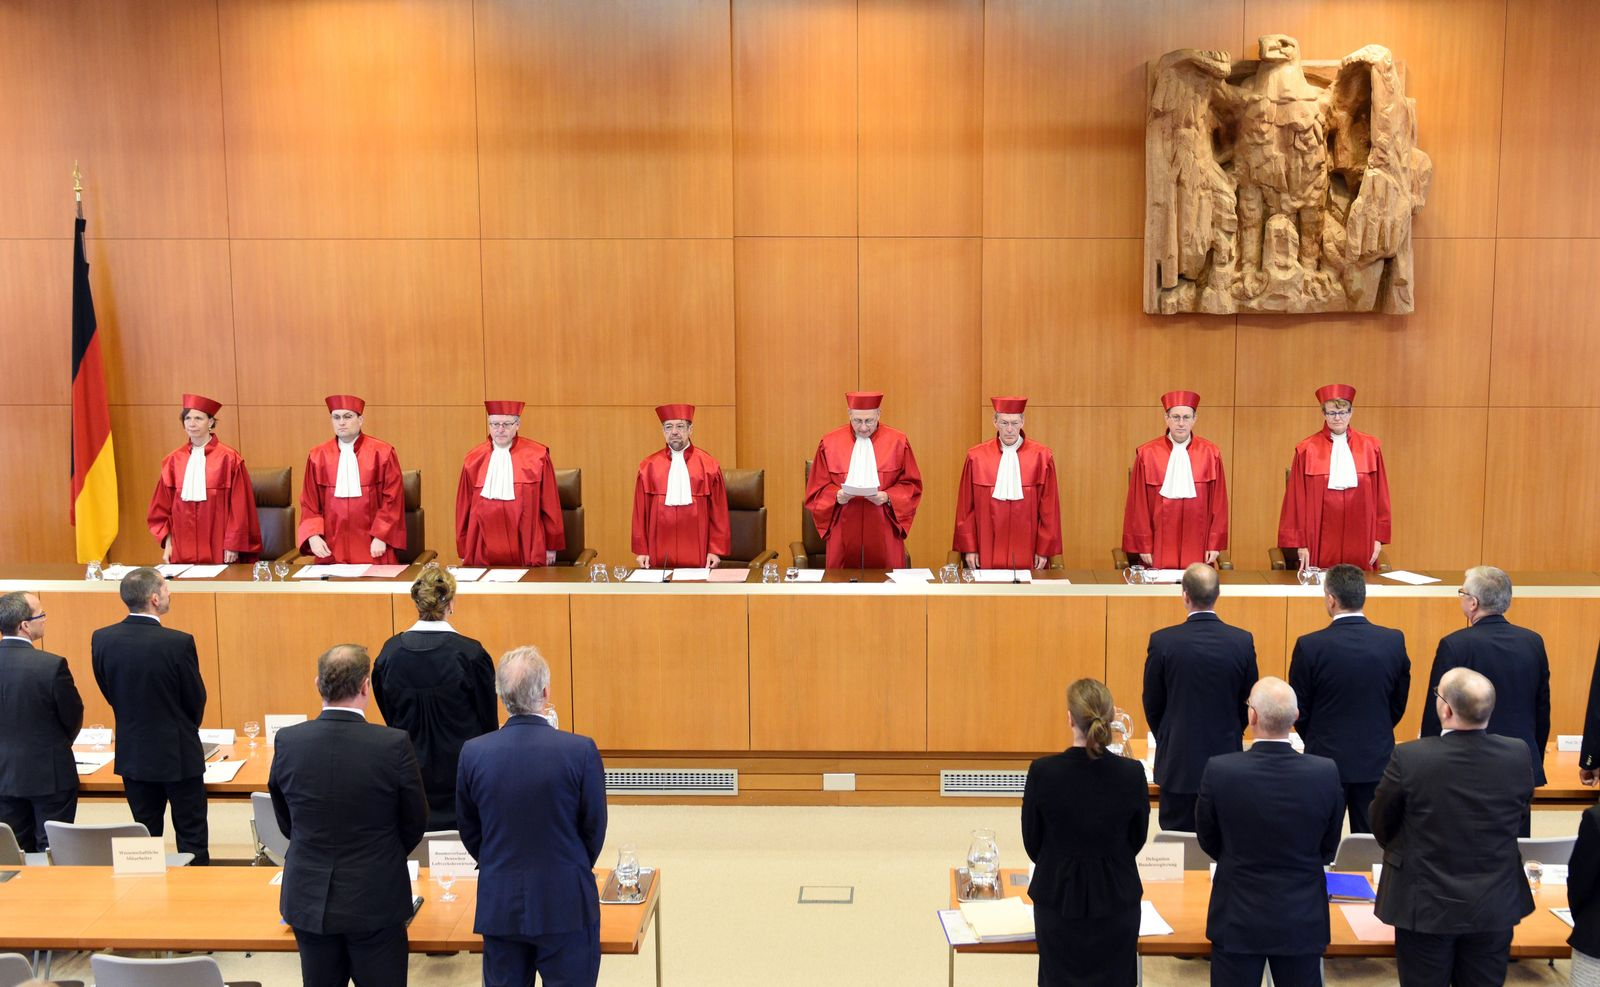 Bundesverfassungsgericht / Erster Senat